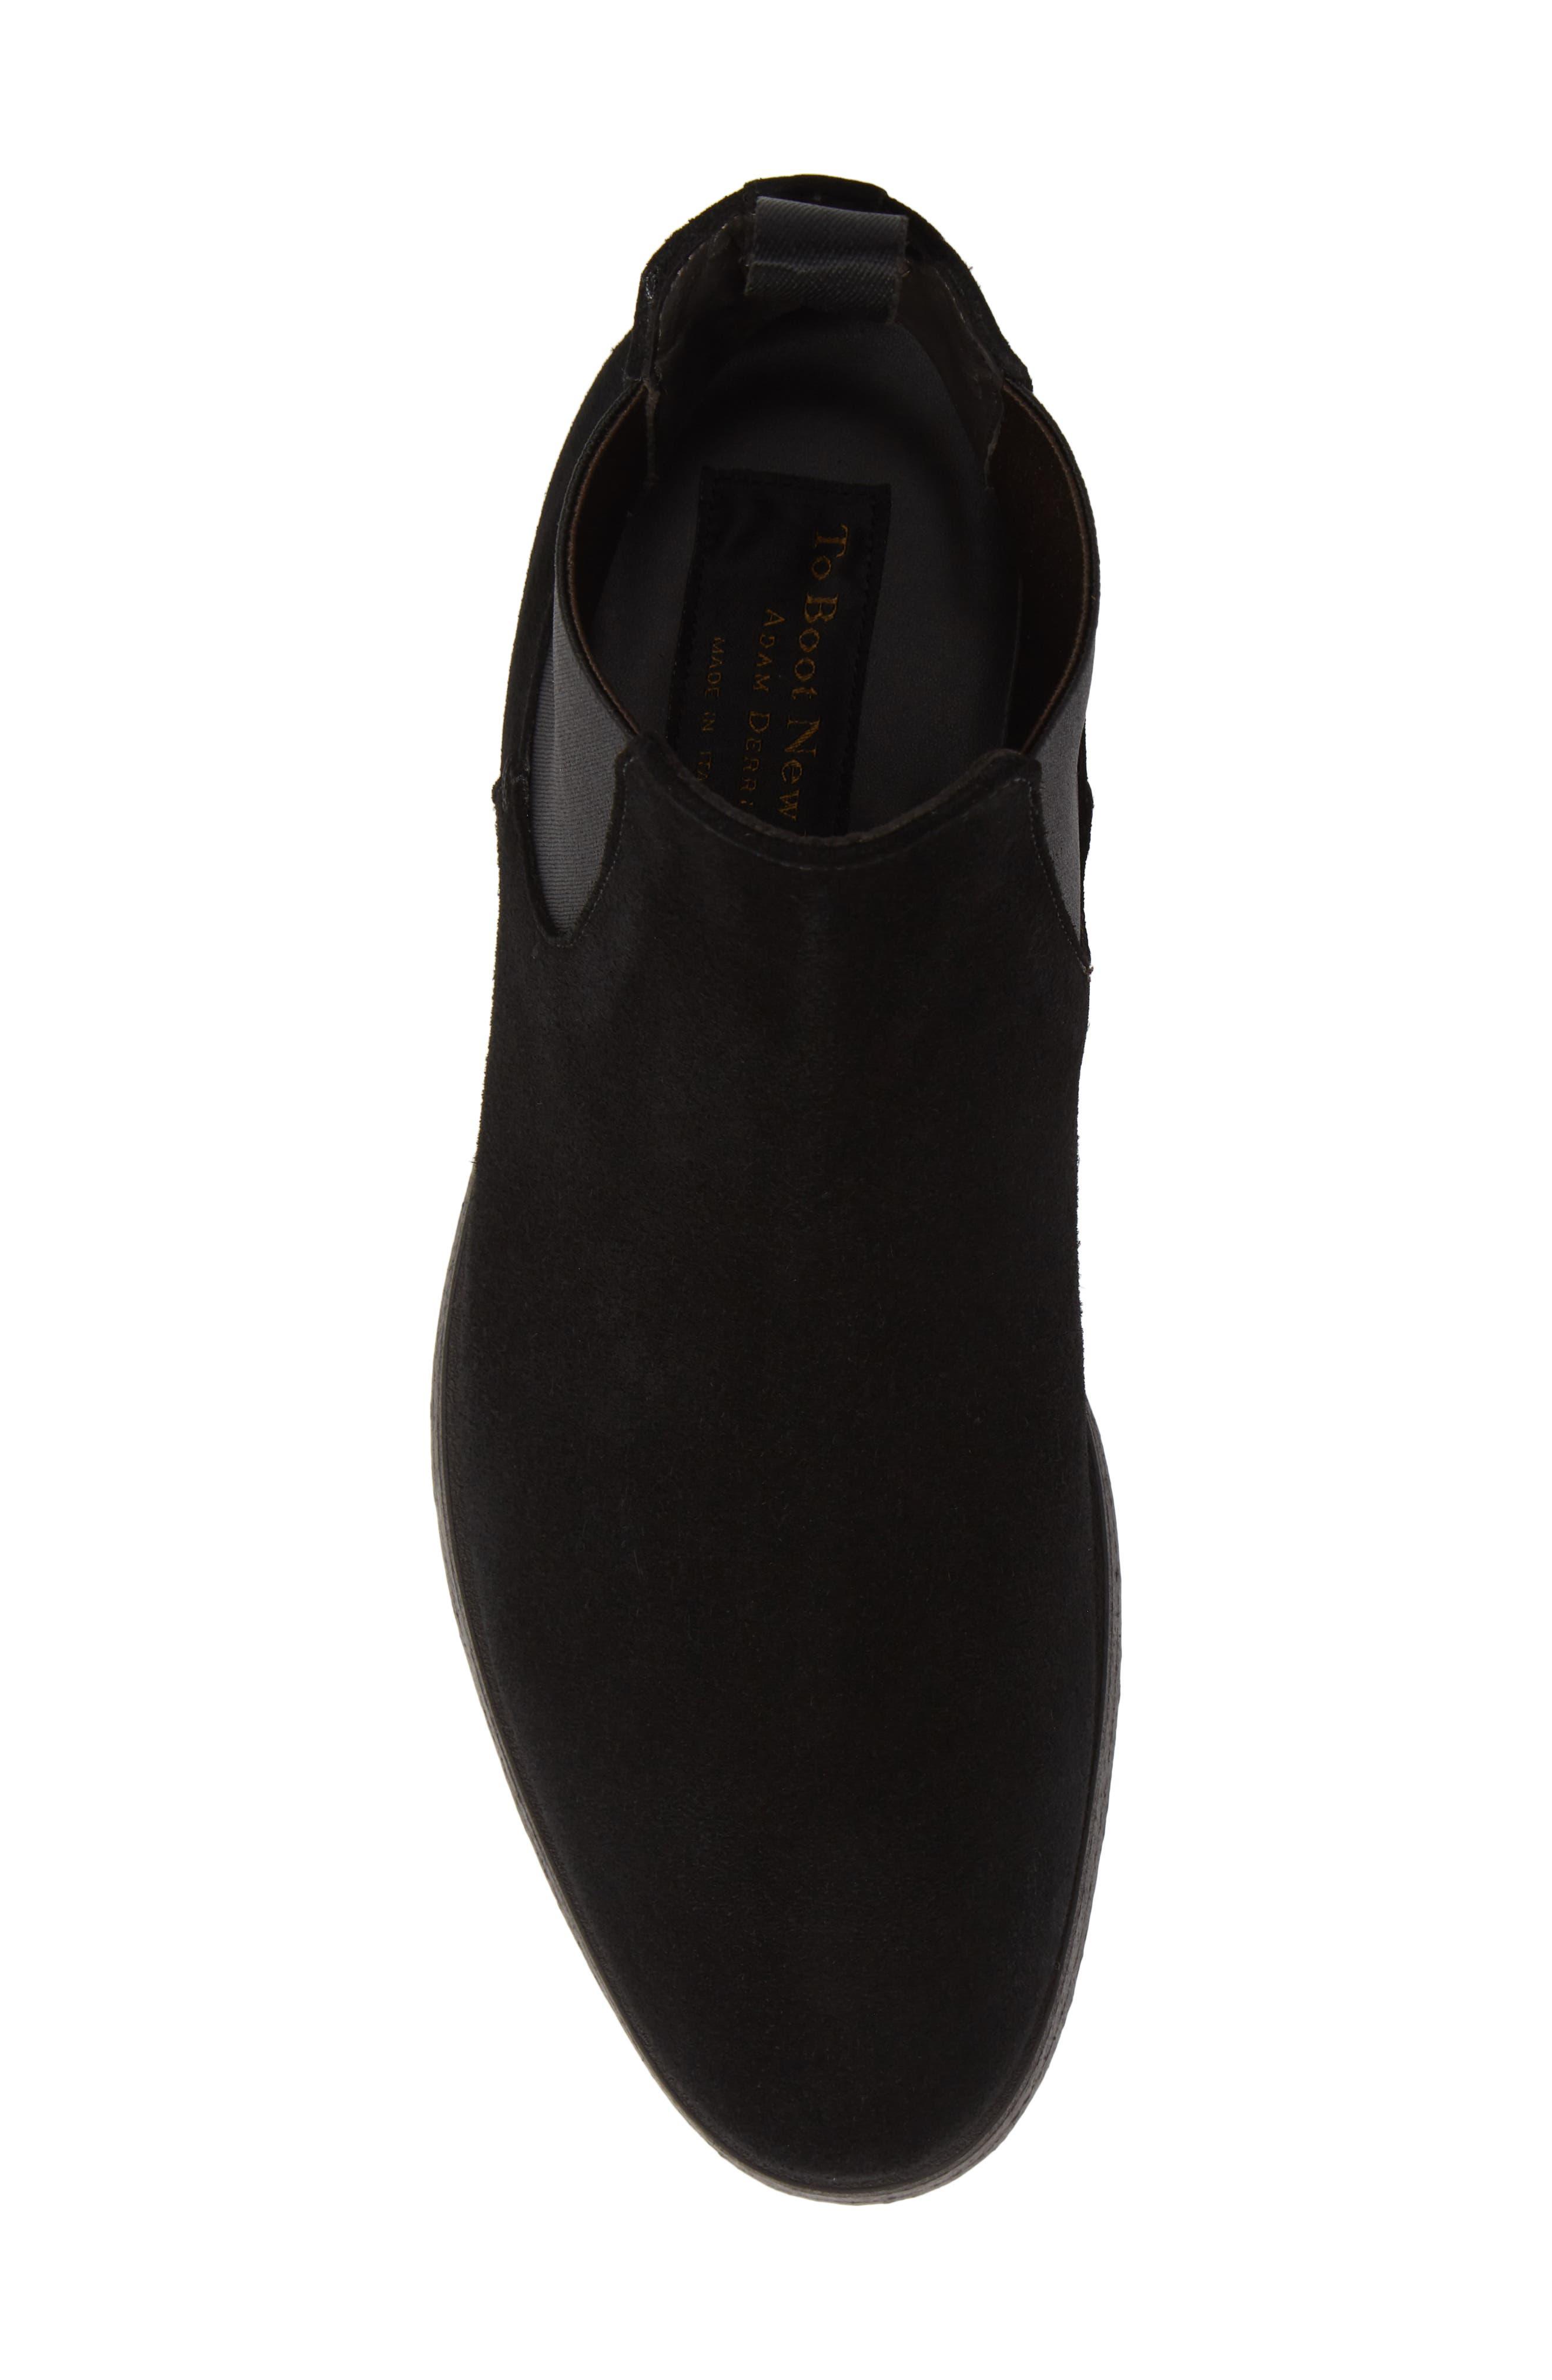 Caracas Chelsea Boot,                             Alternate thumbnail 5, color,                             BLACK SUEDE/ LEATHER